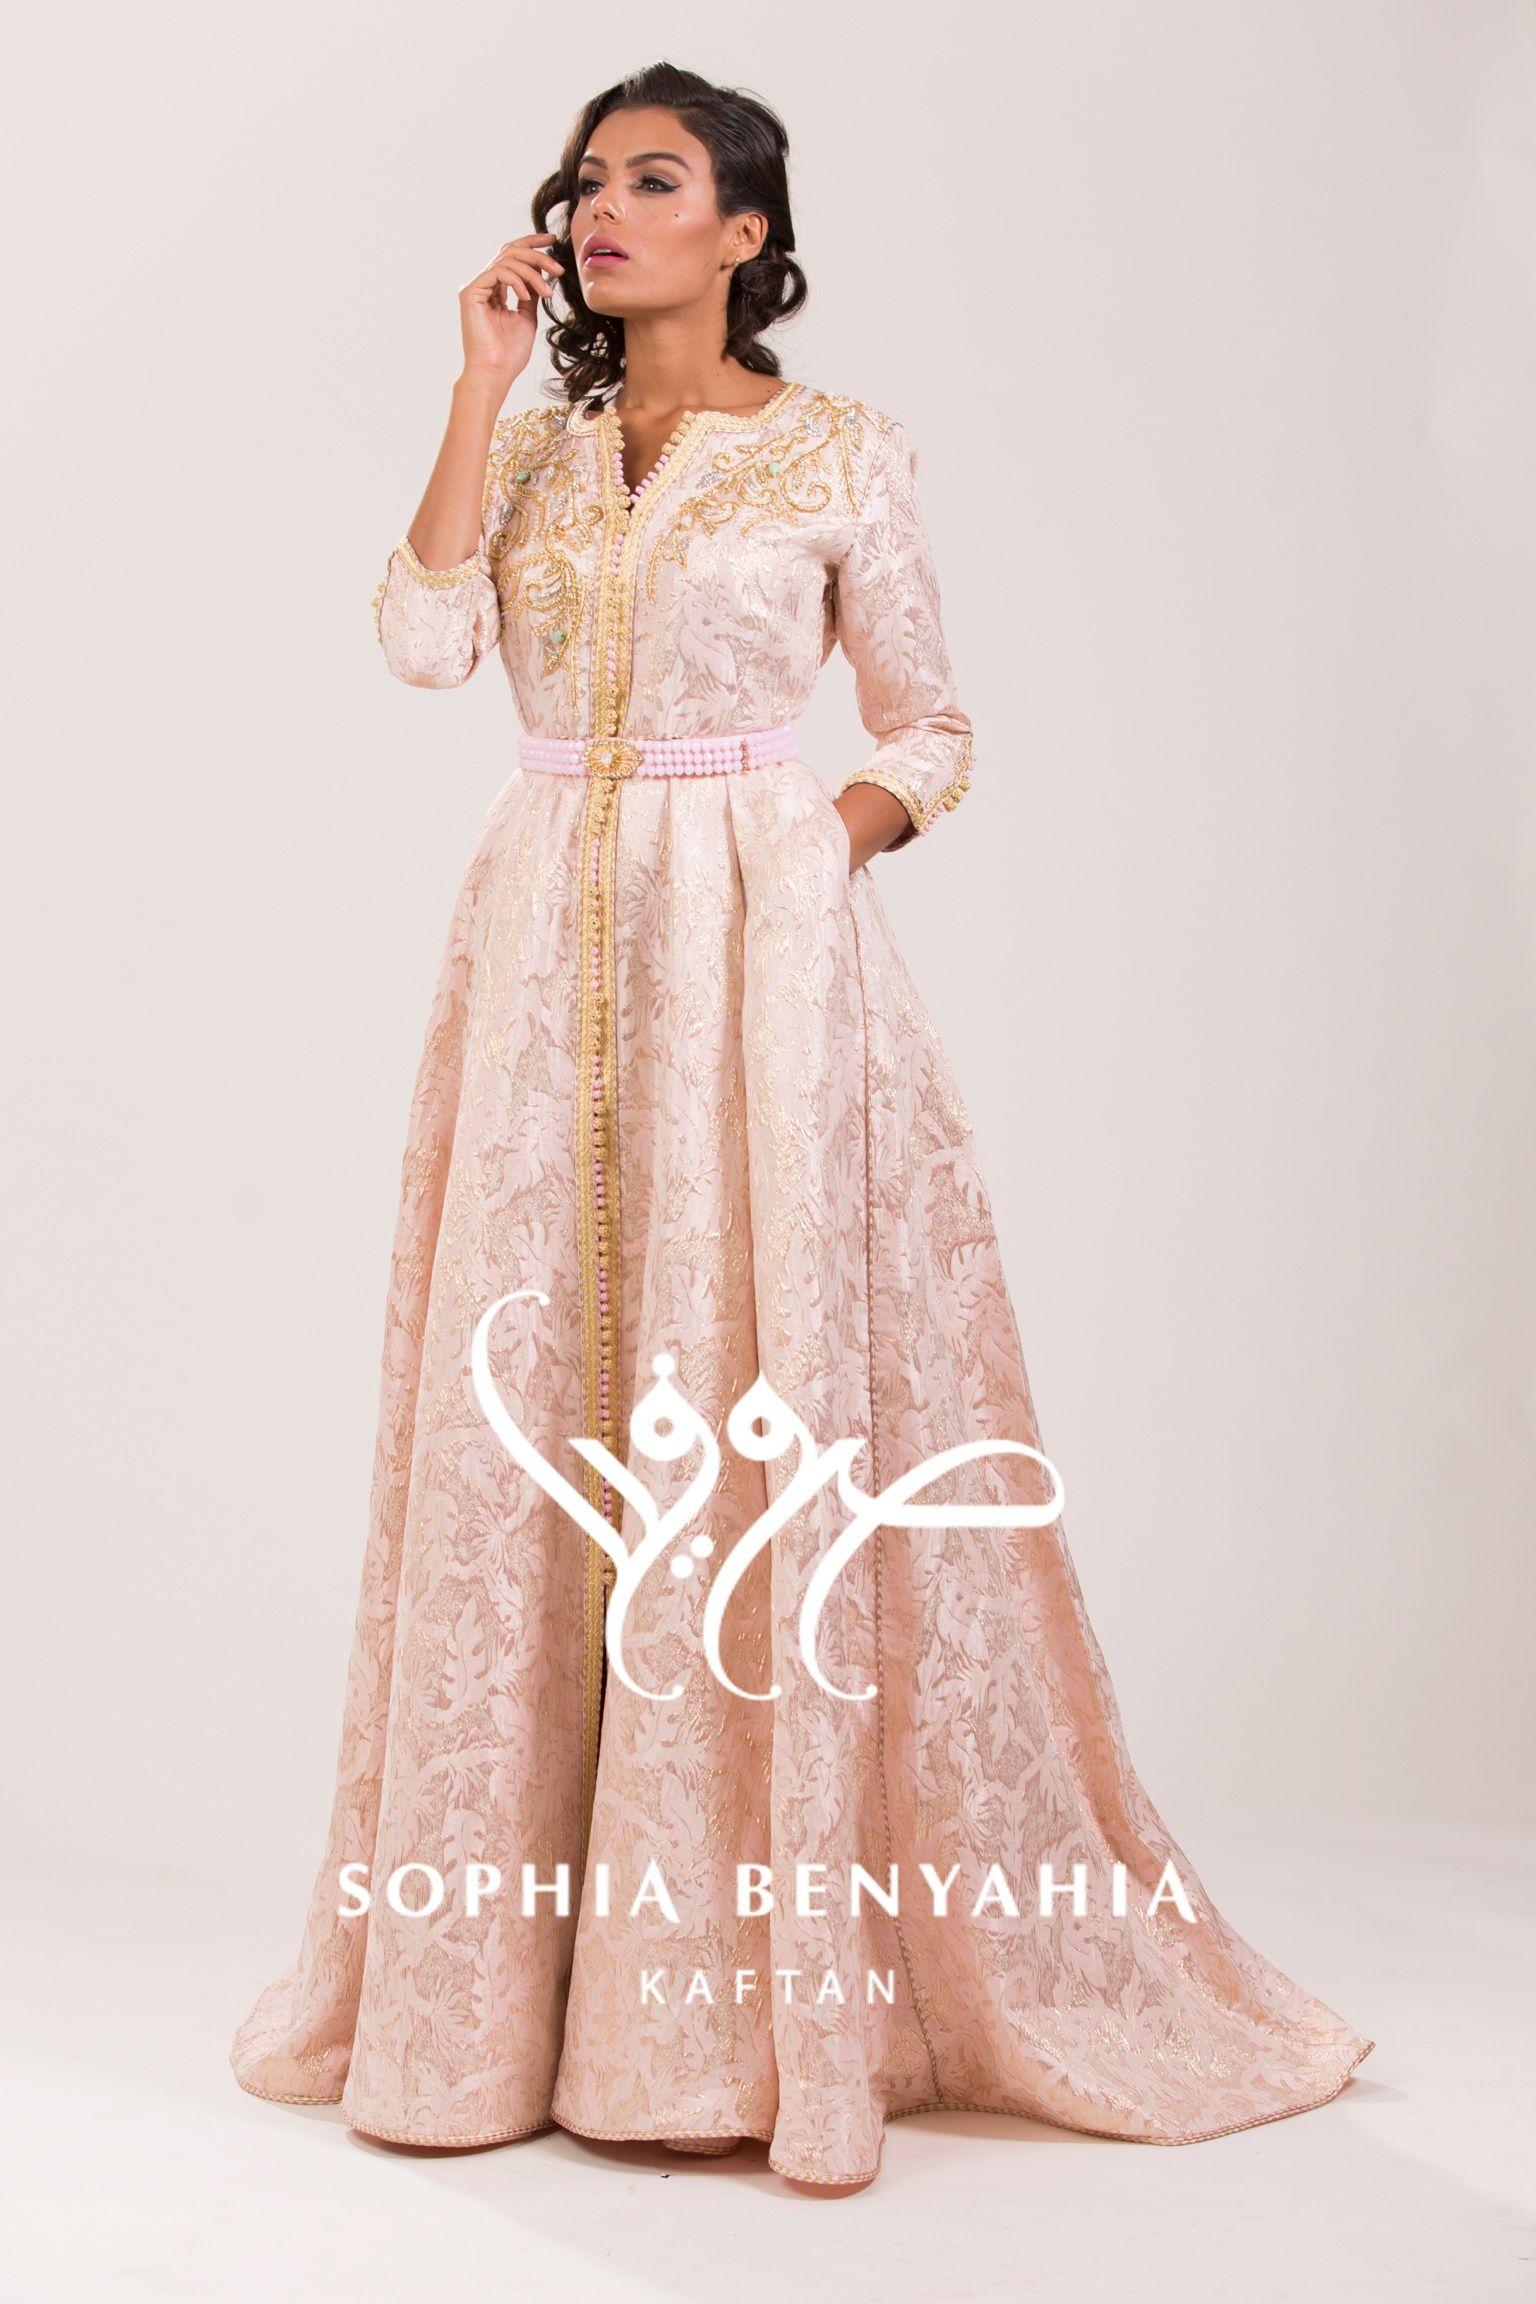 Pin von Sophia Benyahia auf Sophia Benyahia kaftan | Pinterest